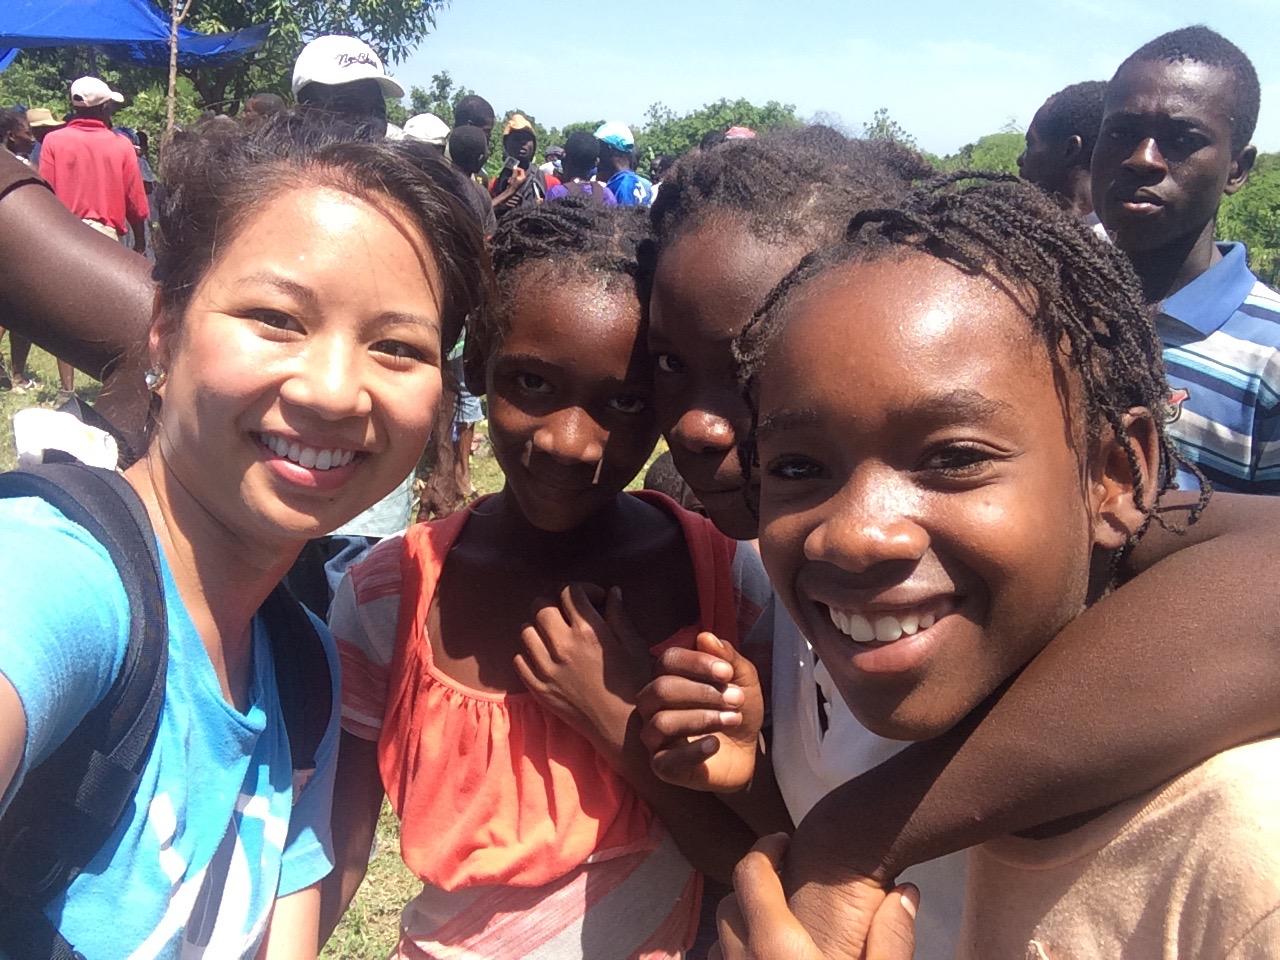 Linnette poses with children in Haiti.